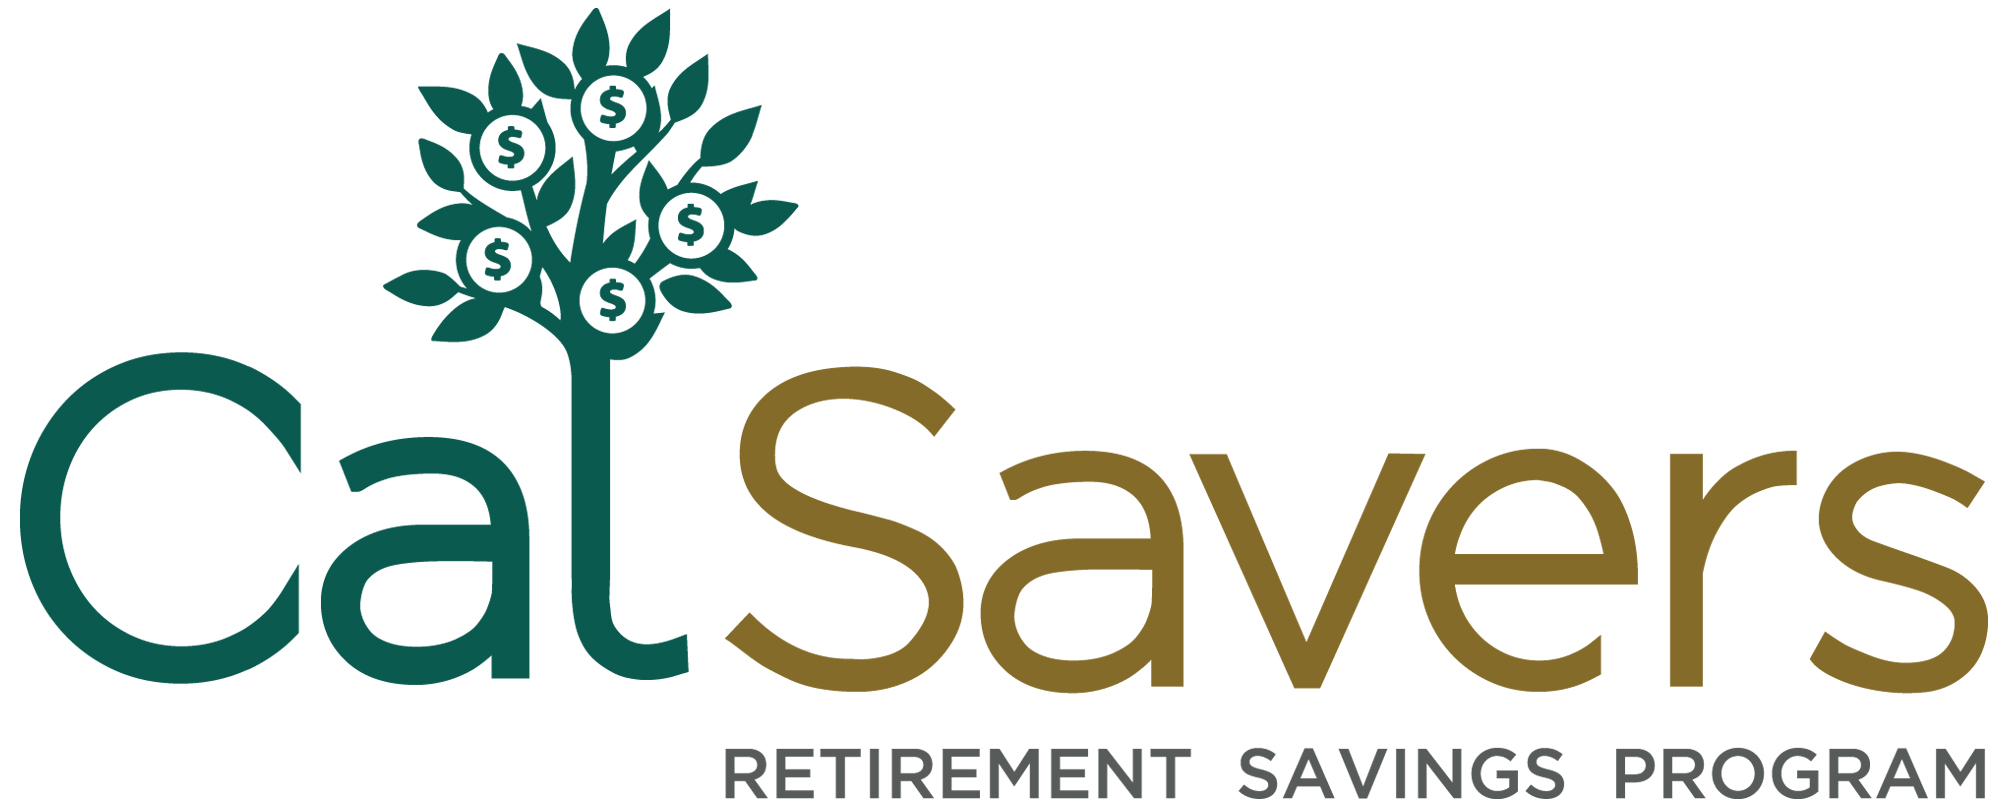 State Run Retirement Savings Plan Gets Ok Mandatory Enrollment